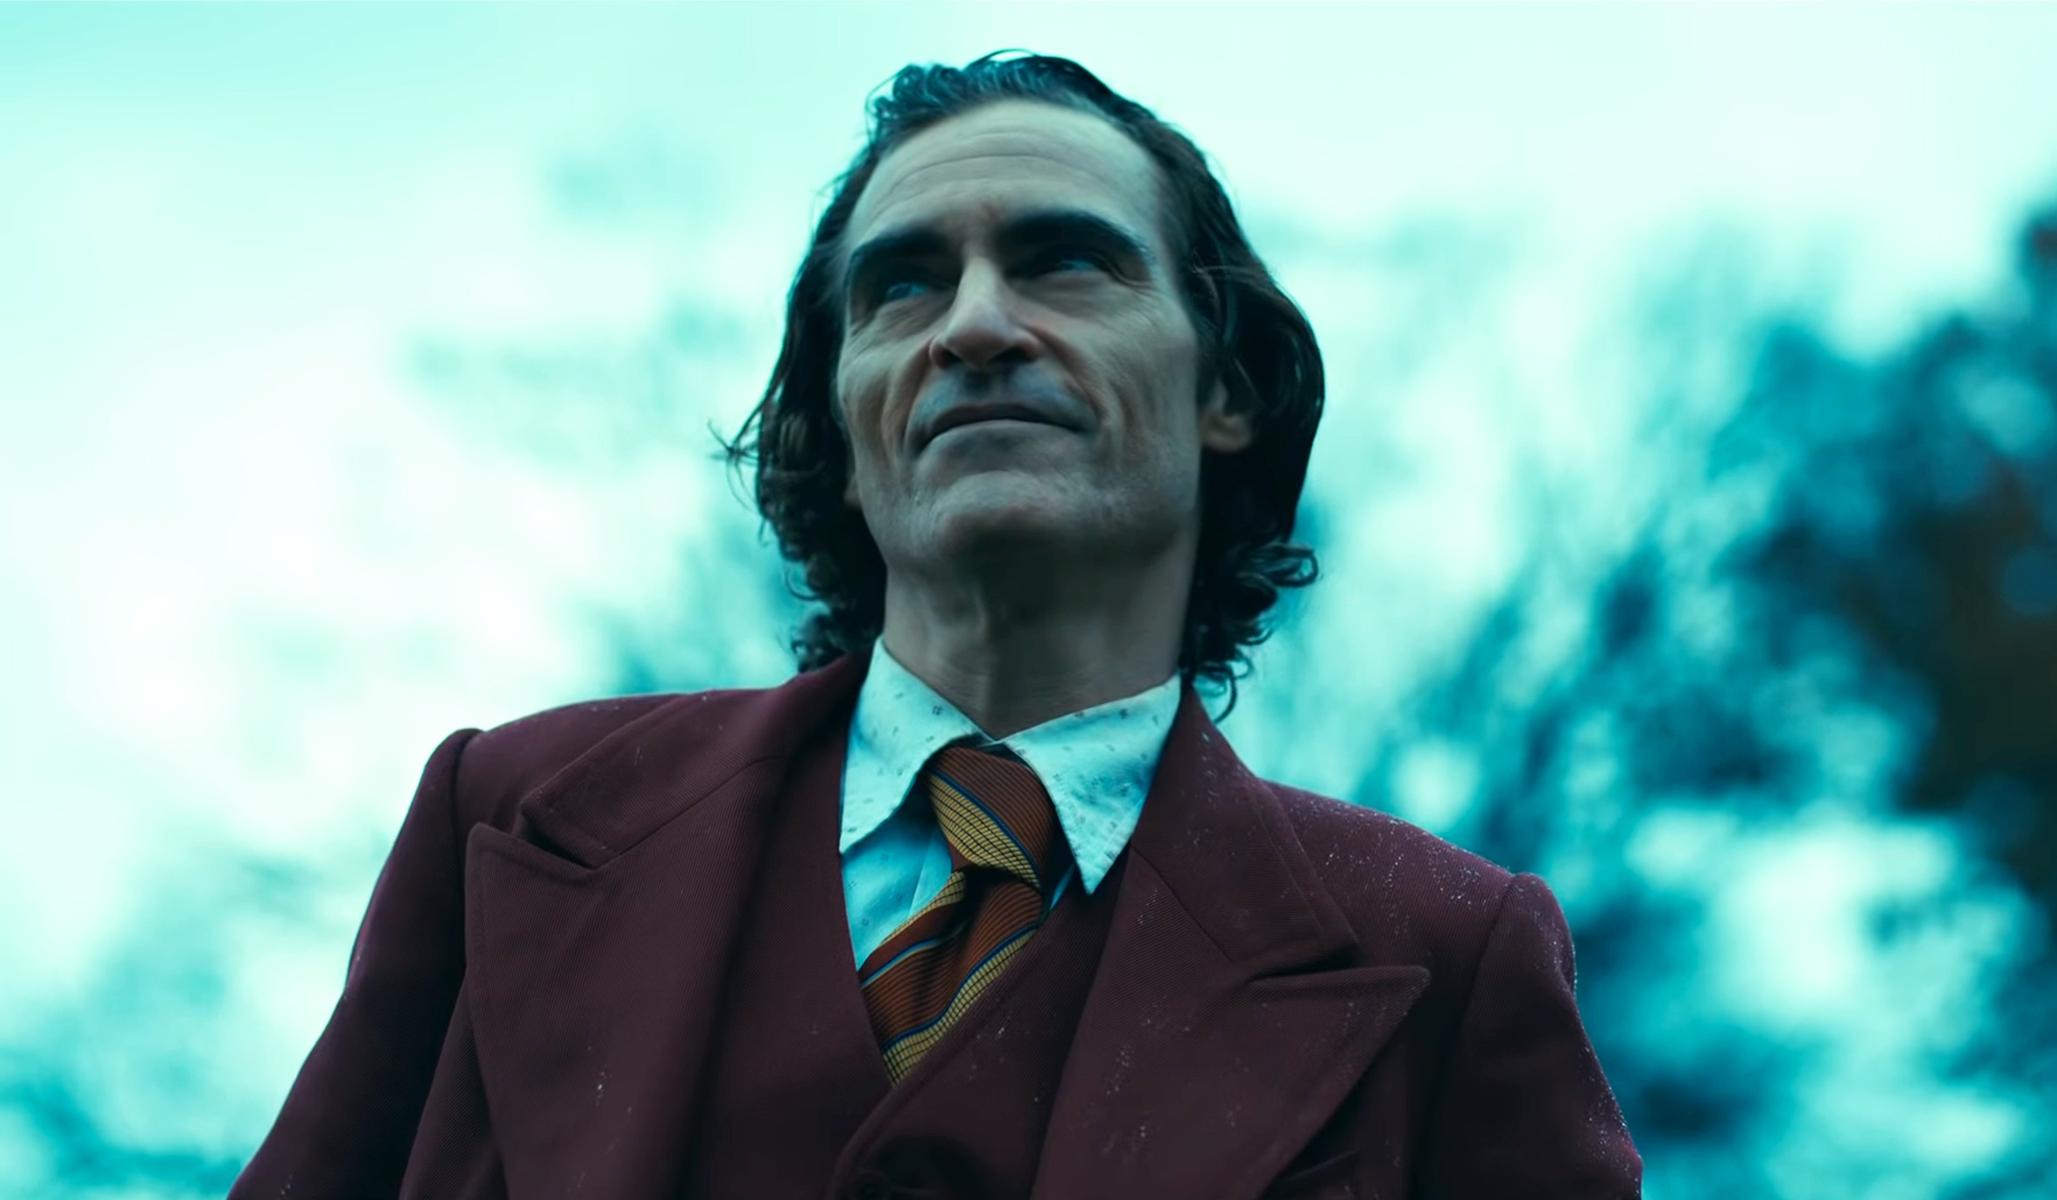 Movie Review: 'Joker' an Honest Treatment of Madness